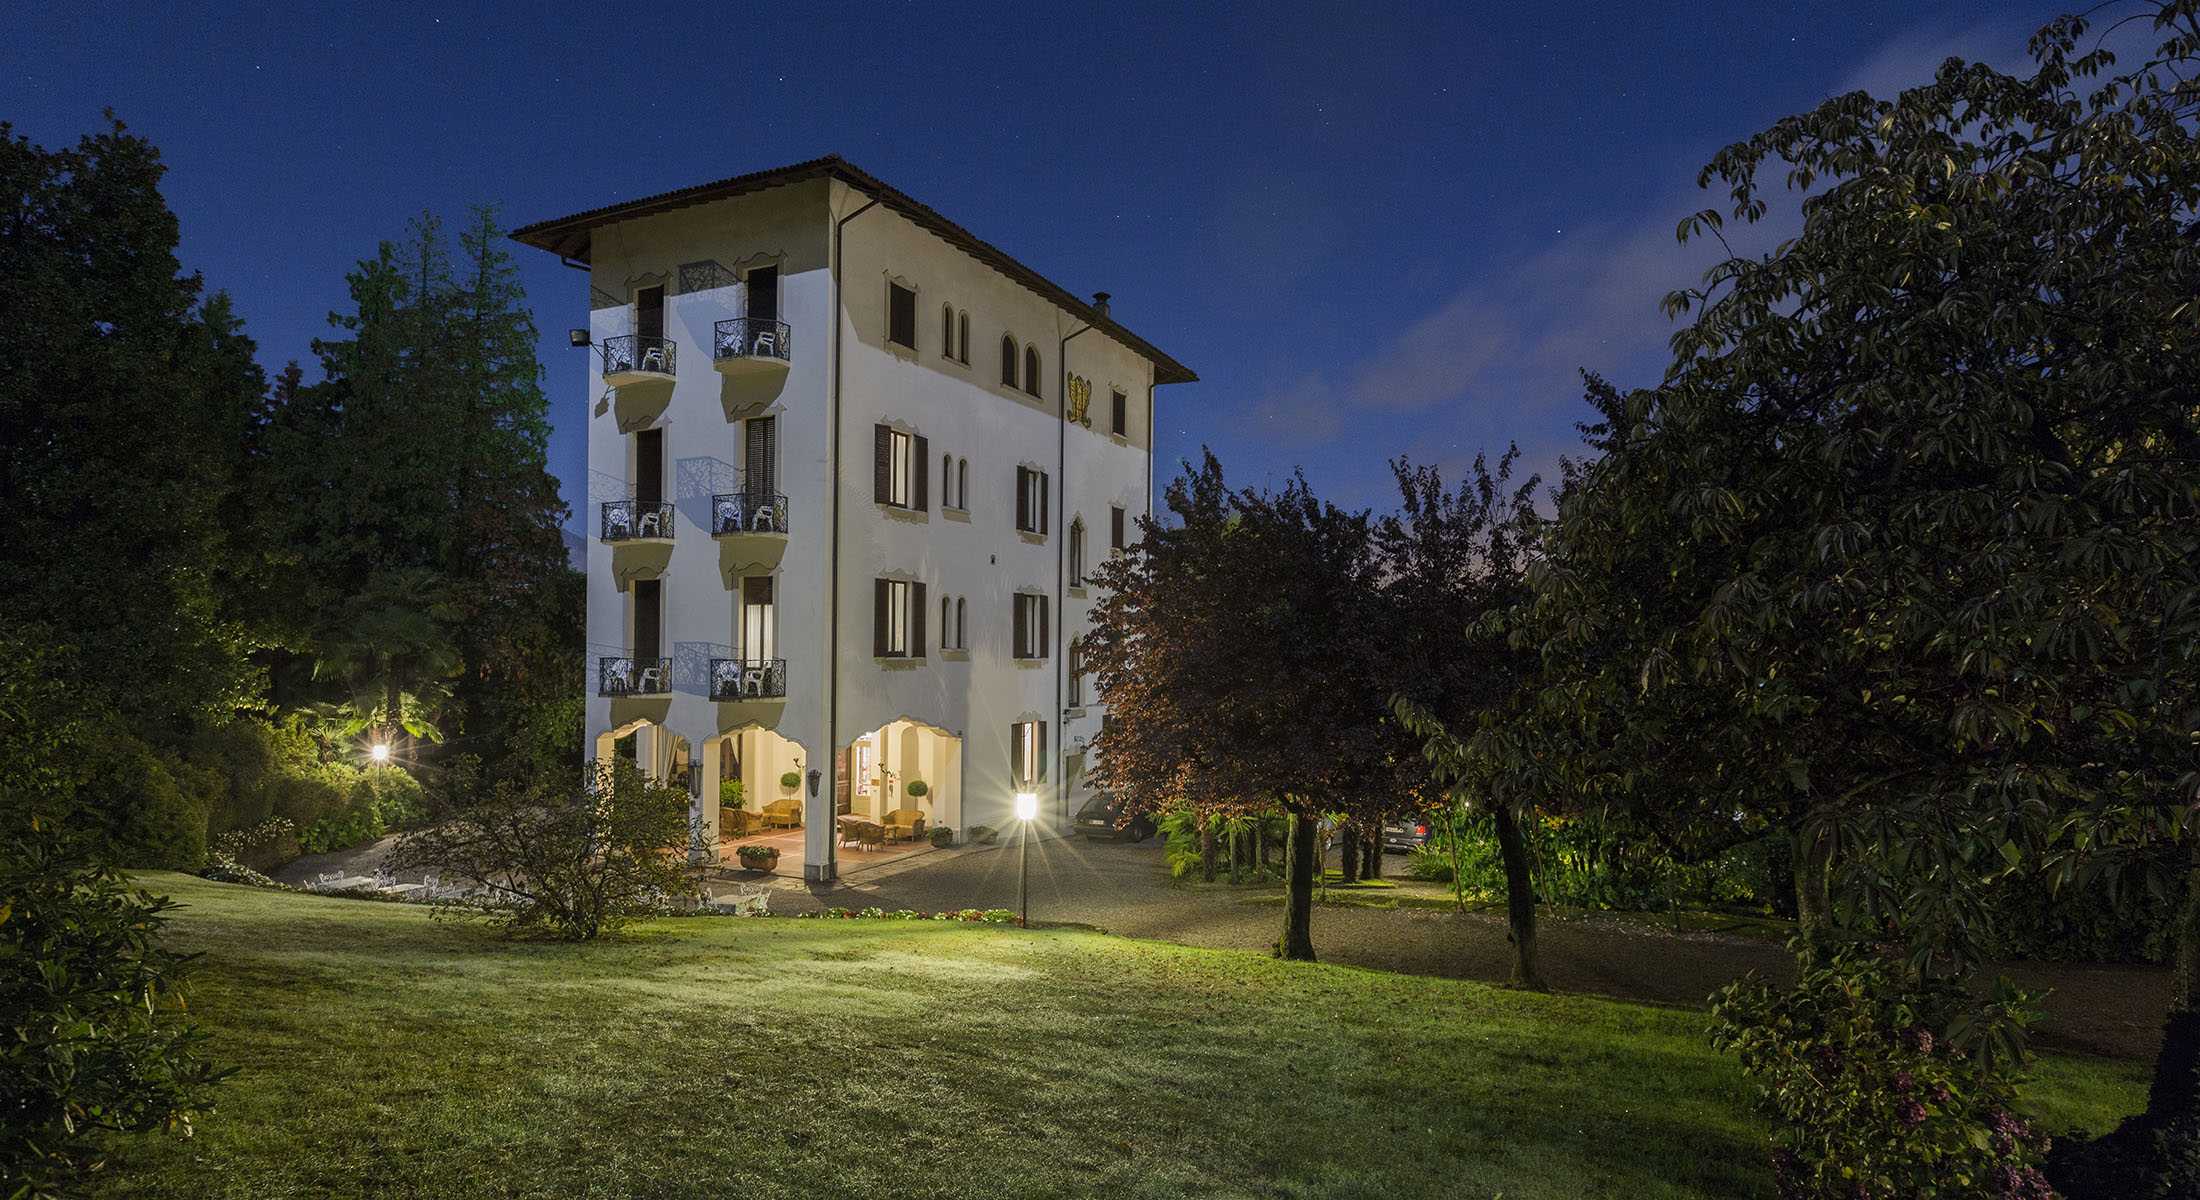 La Credenza San Maurizio Canavese Menu : Hotel du parc in stresa historischen villa buchung der